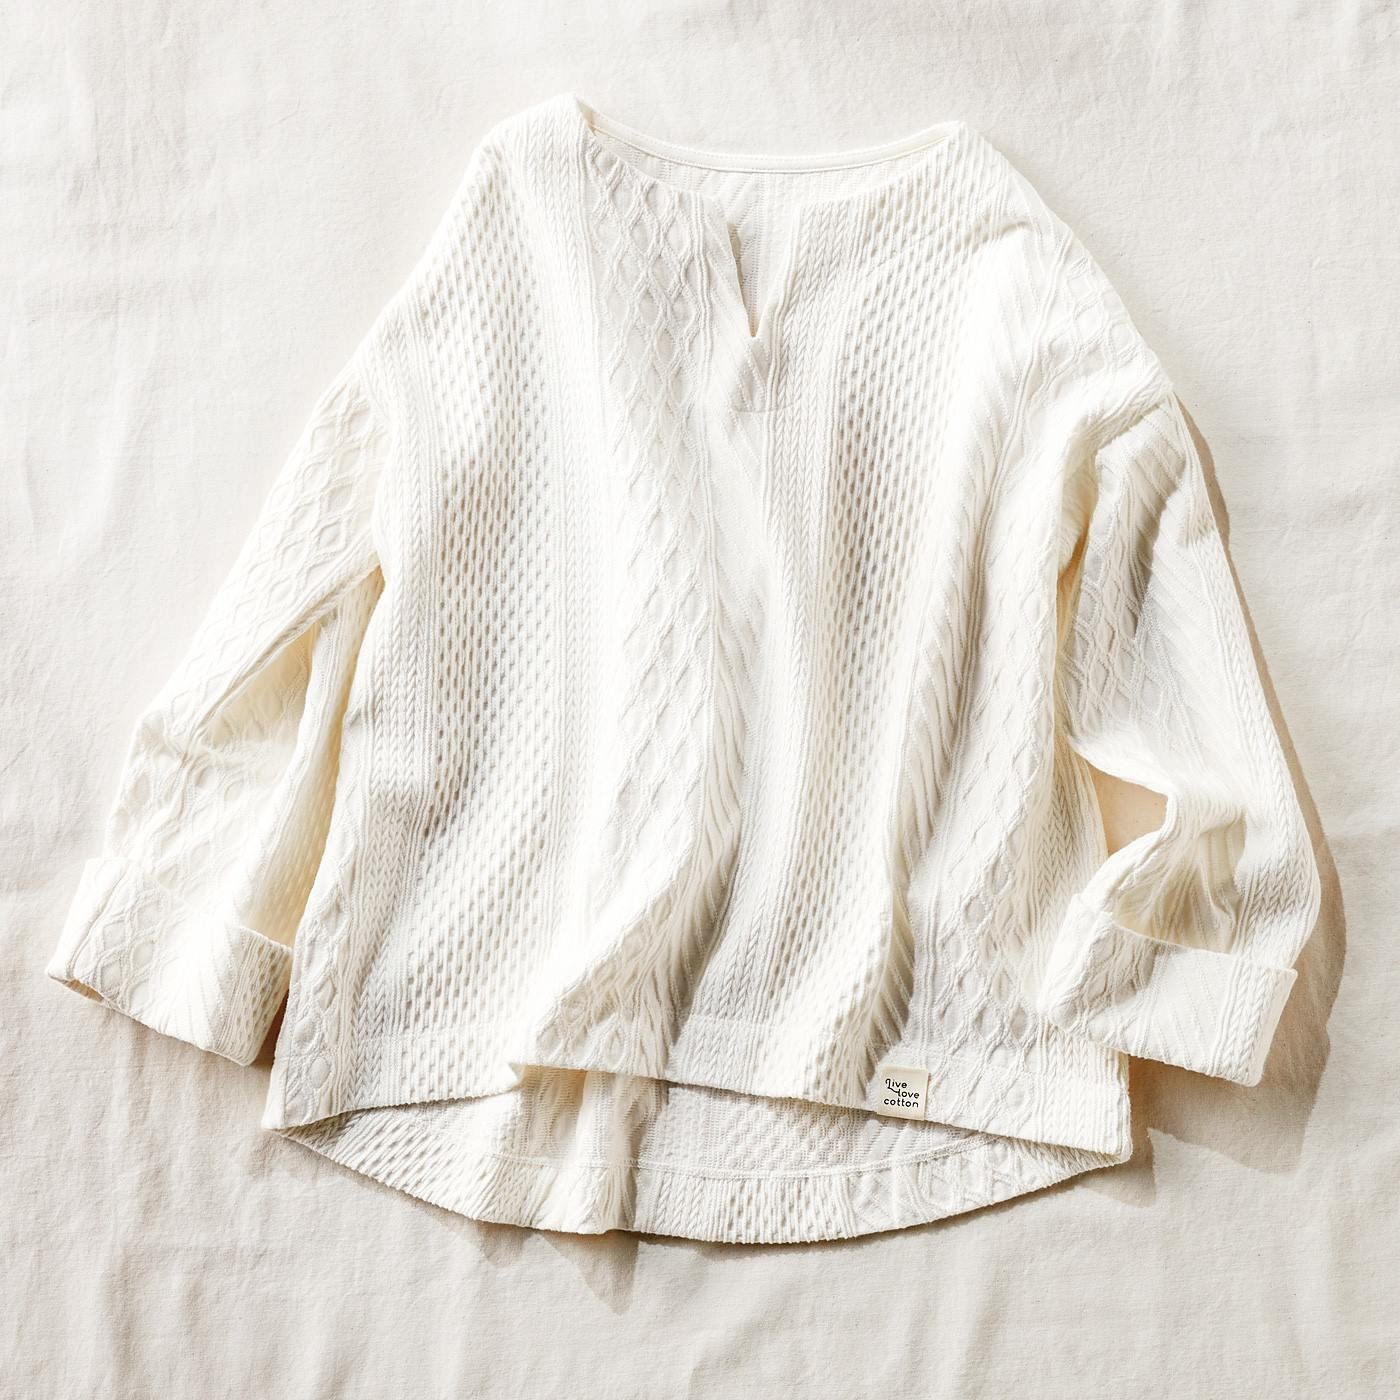 Live love cottonプロジェクト リブ イン コンフォート しっかり厚手の 柄編みが素敵なオーガニックコットントップス〈オフホワイト〉